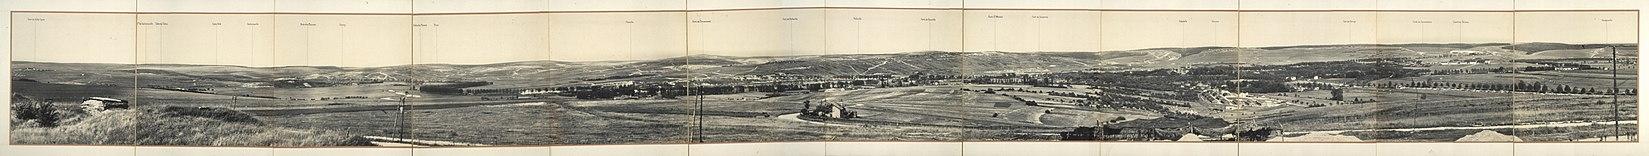 Battle of verdun wikipedia verdun battlefield from fort de la chaume looking northeast 1917 publicscrutiny Choice Image